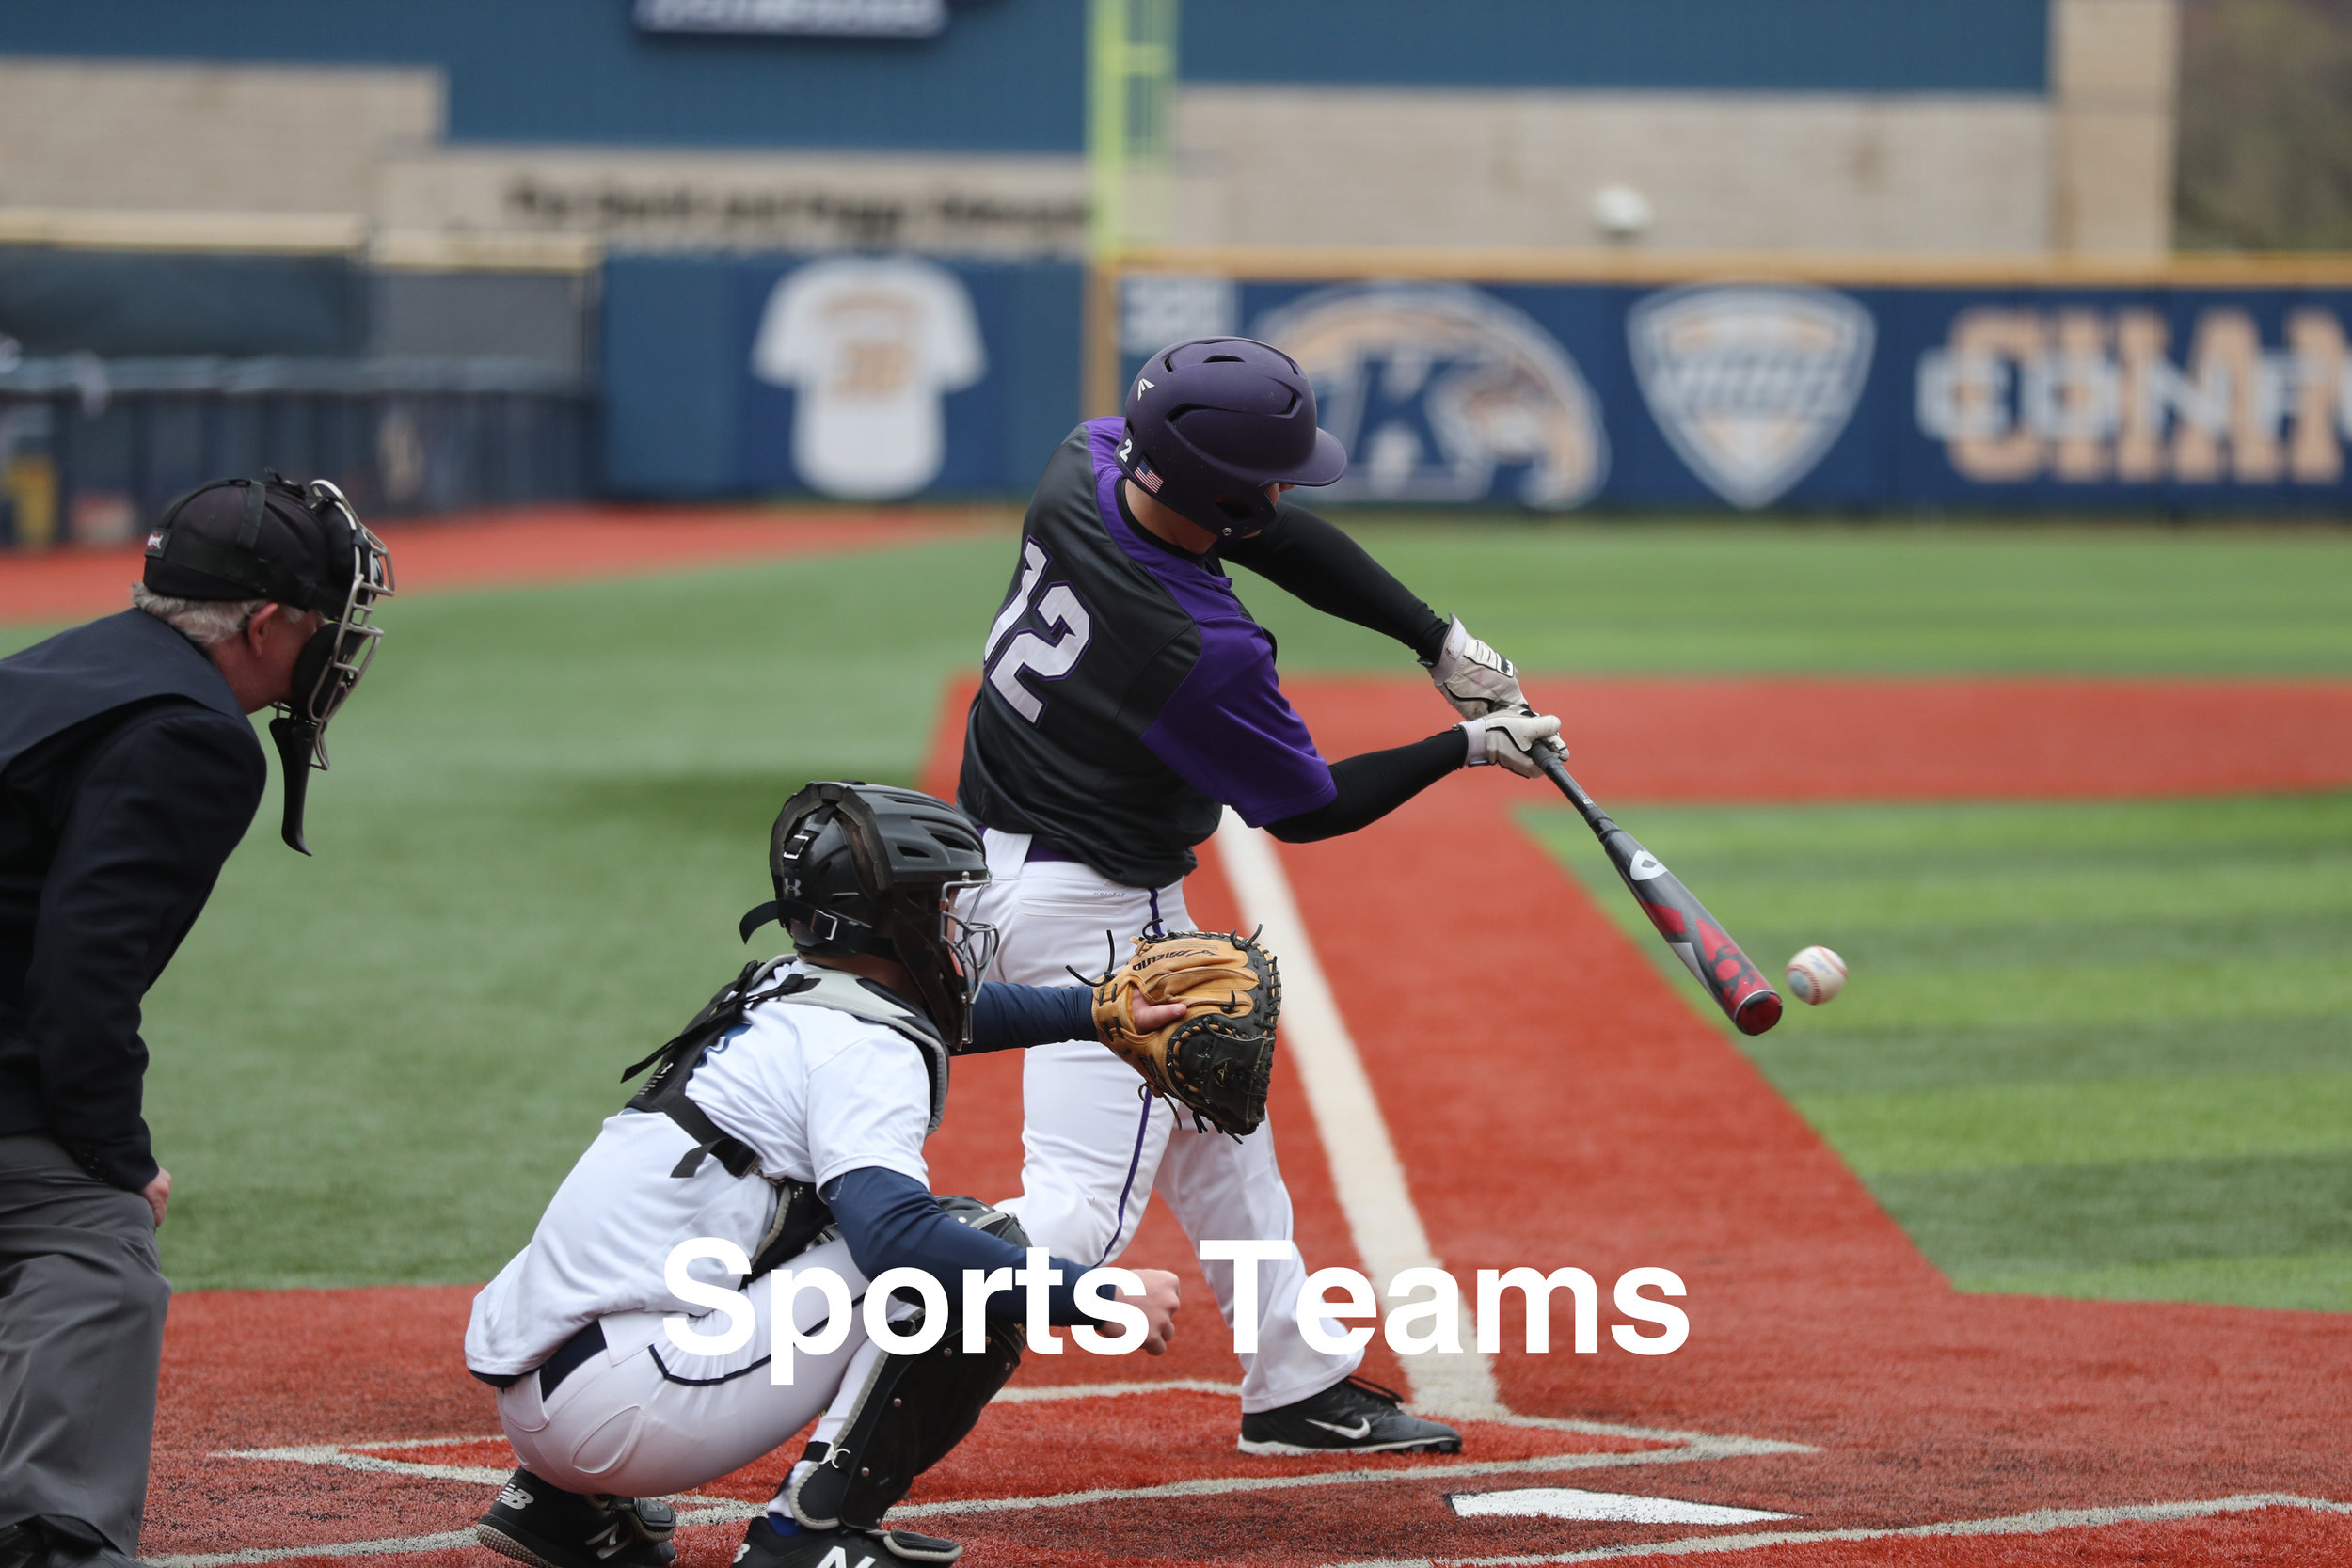 Sports Team Text.jpg